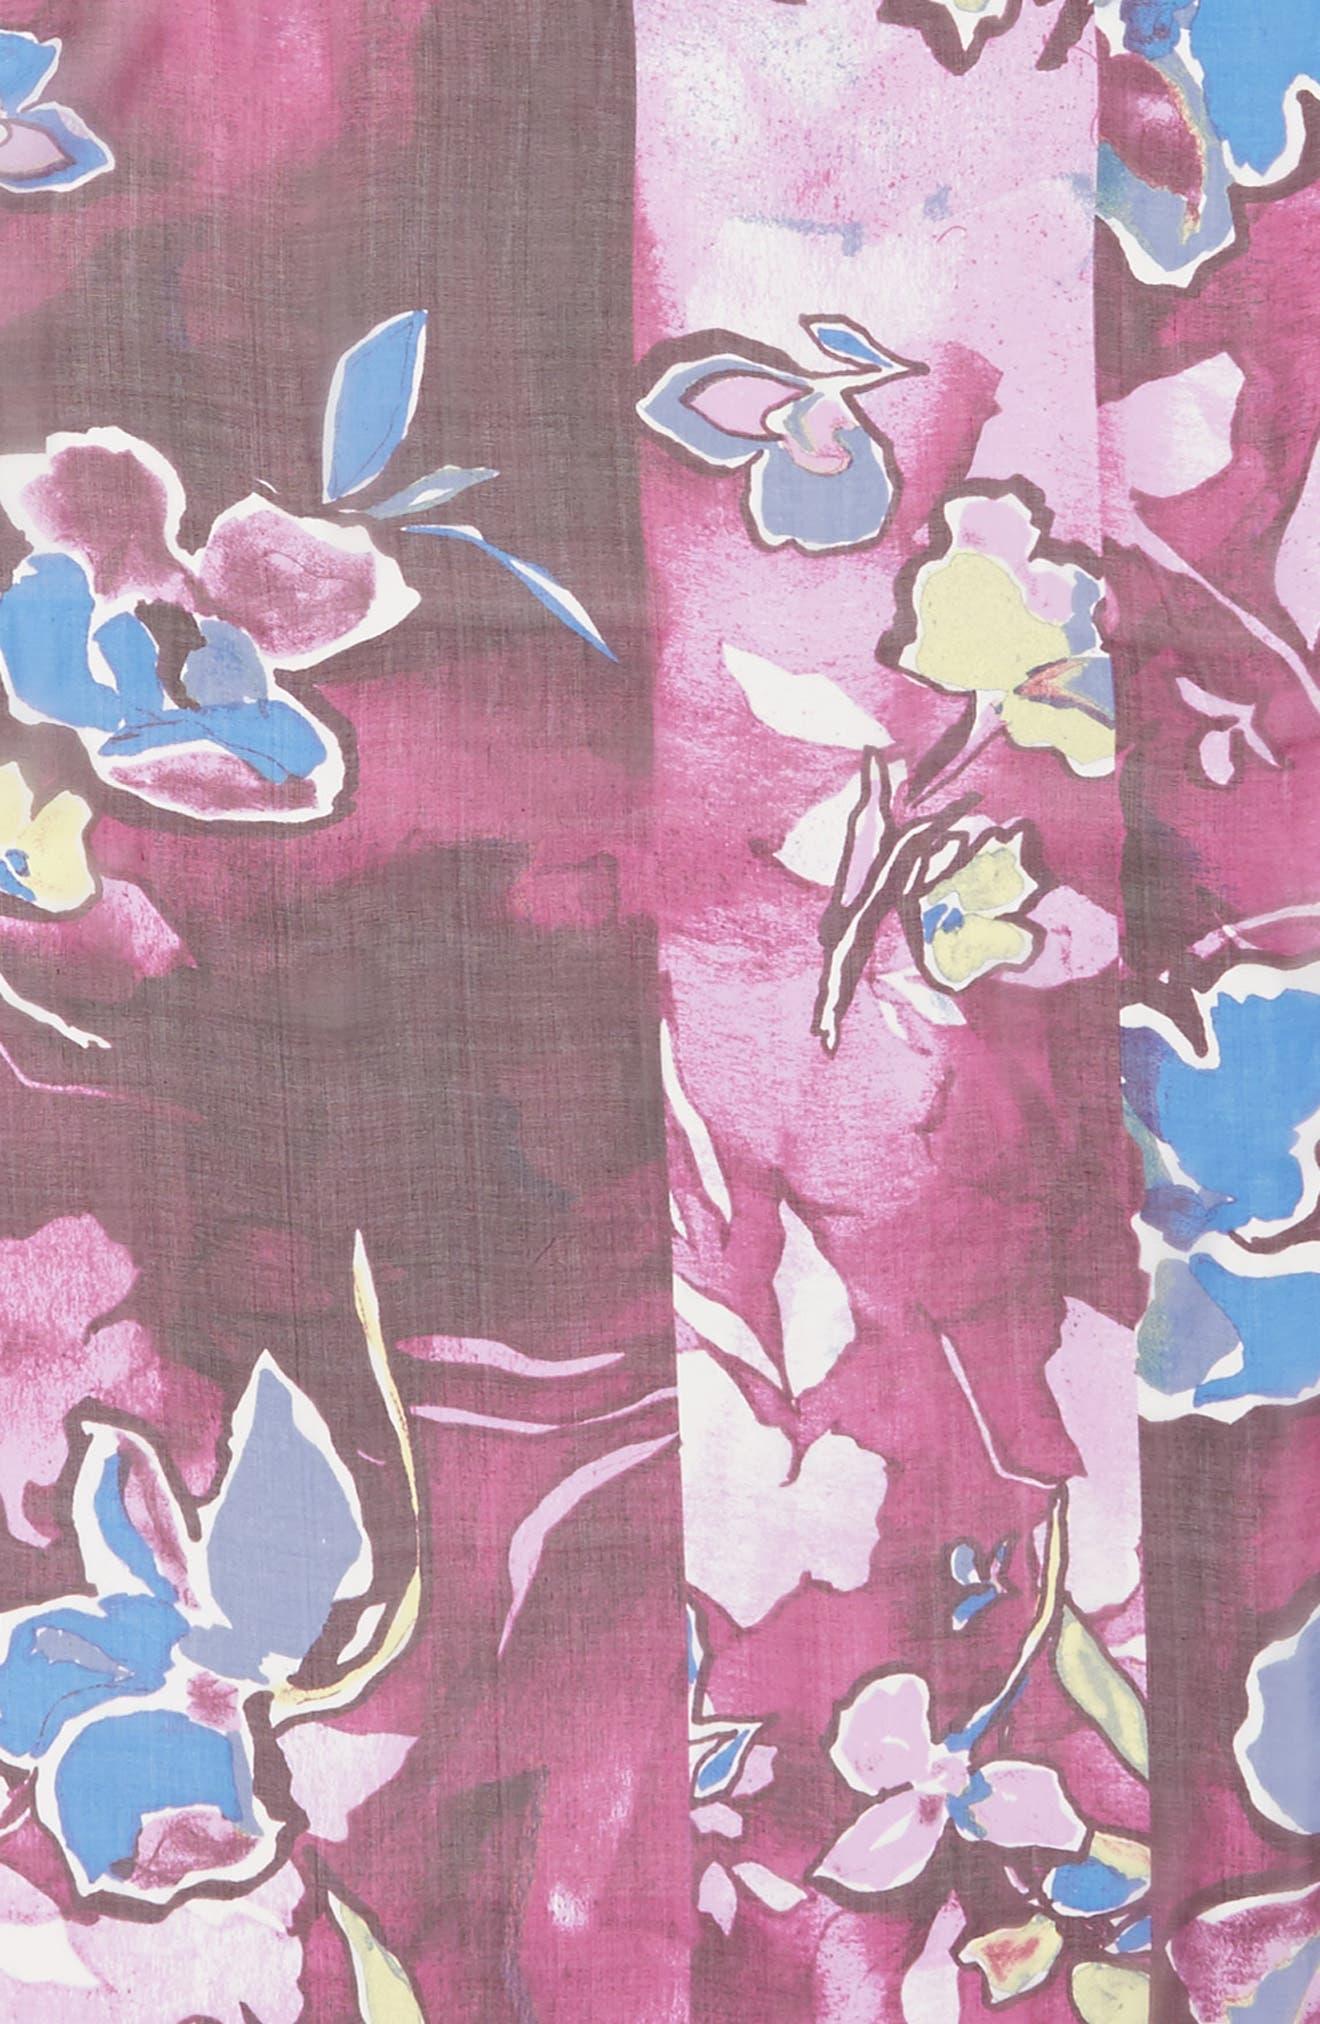 Silk Chiffon Oblong Scarf,                             Alternate thumbnail 4, color,                             Purple Textured Blooms